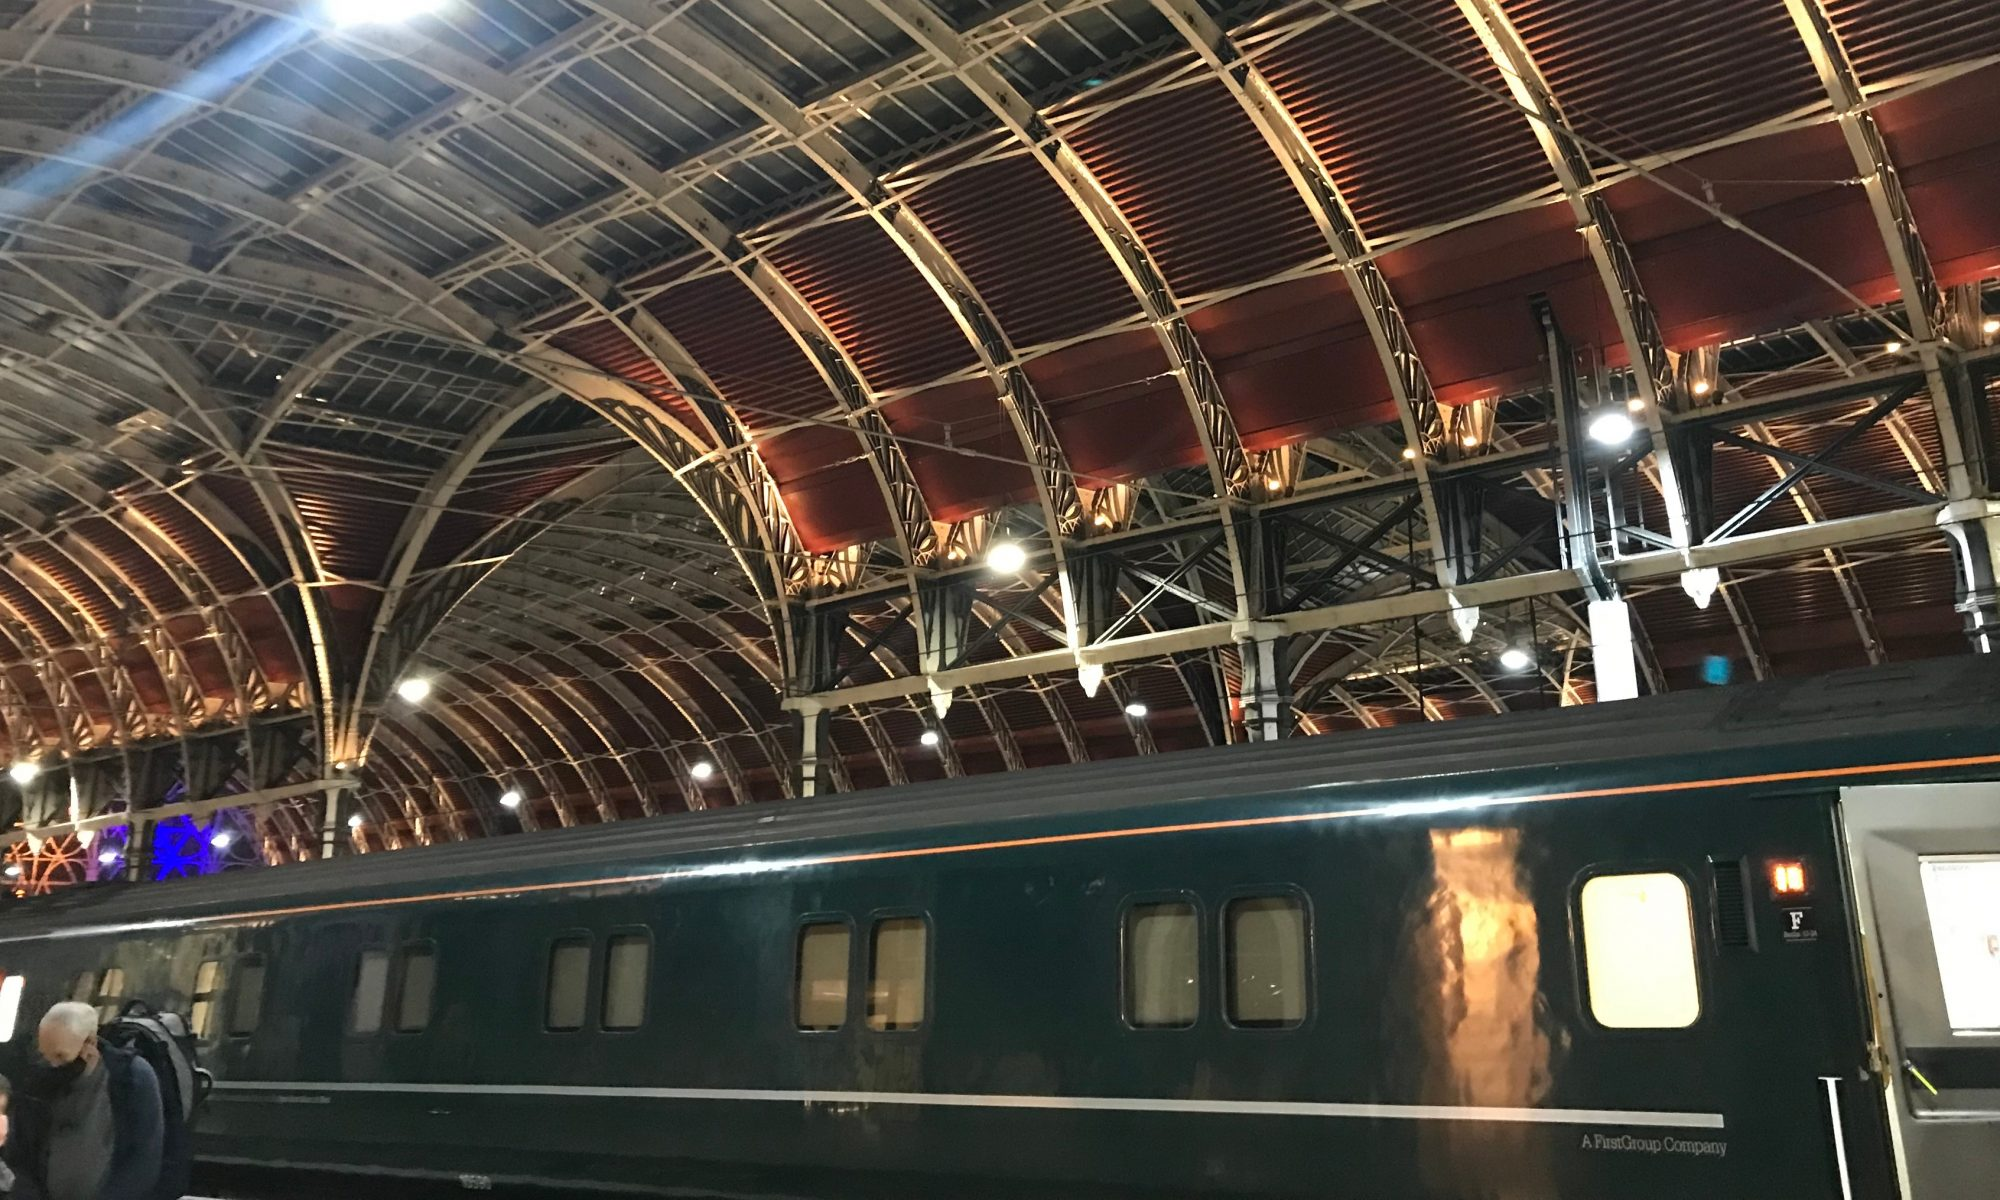 Sleeper train from London to Cornwall